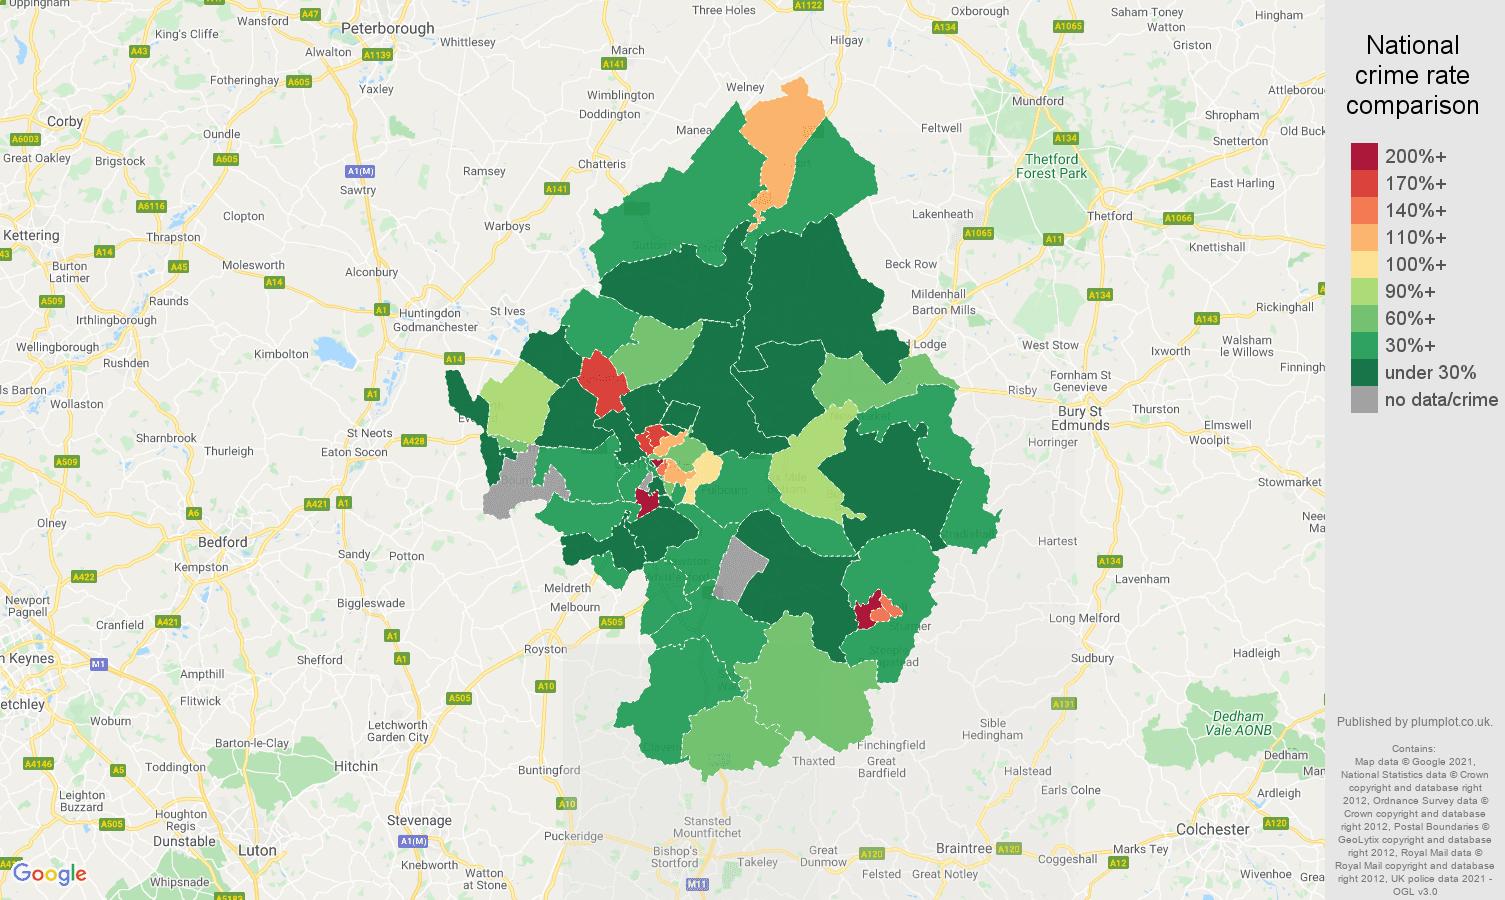 Cambridge drugs crime rate comparison map